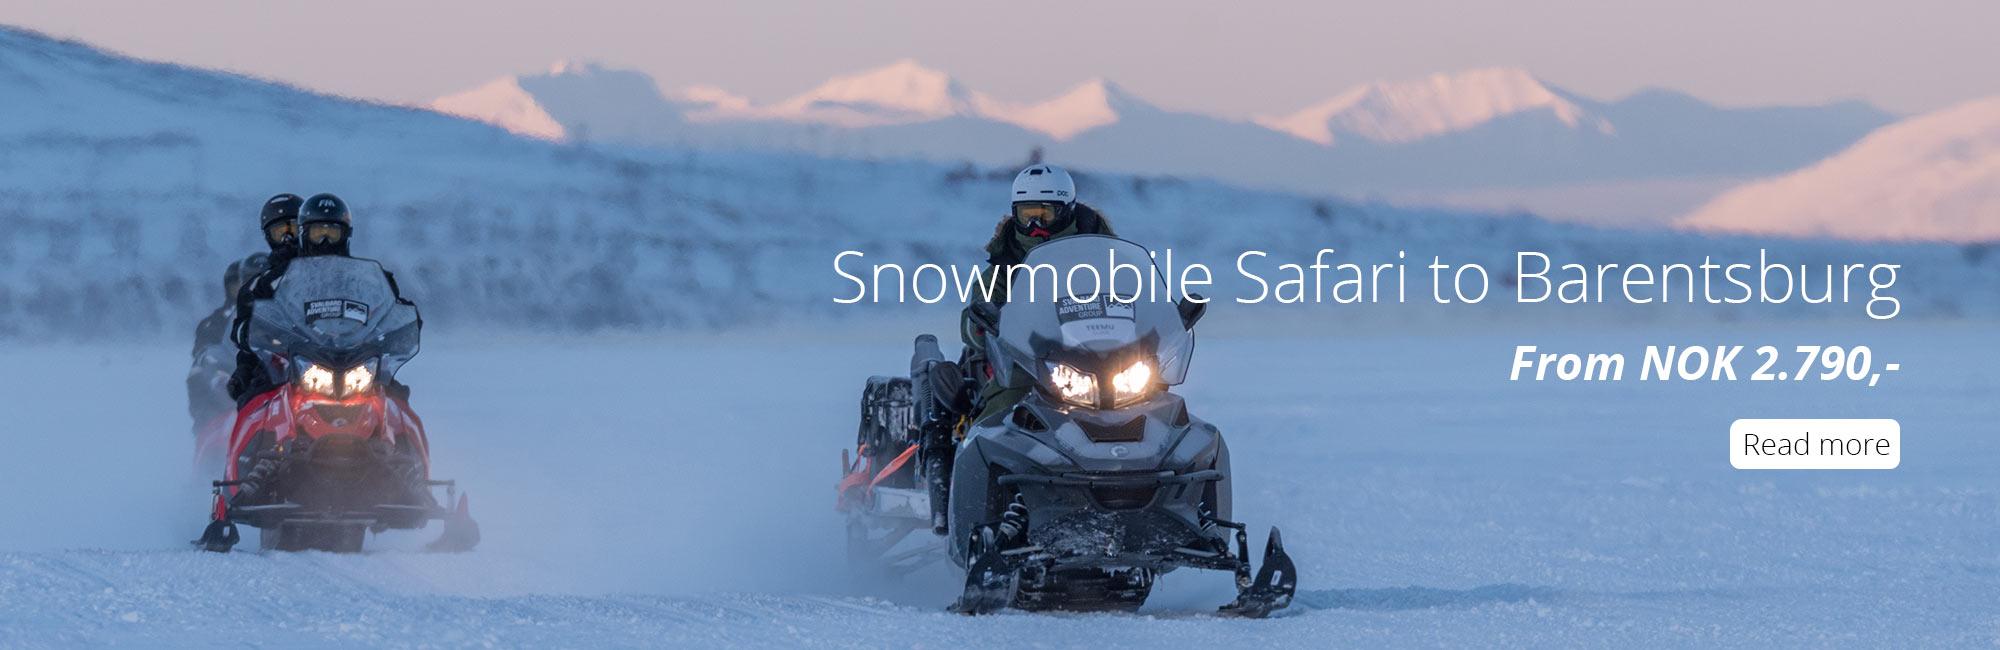 Snowmobile Safari to Barentsburg